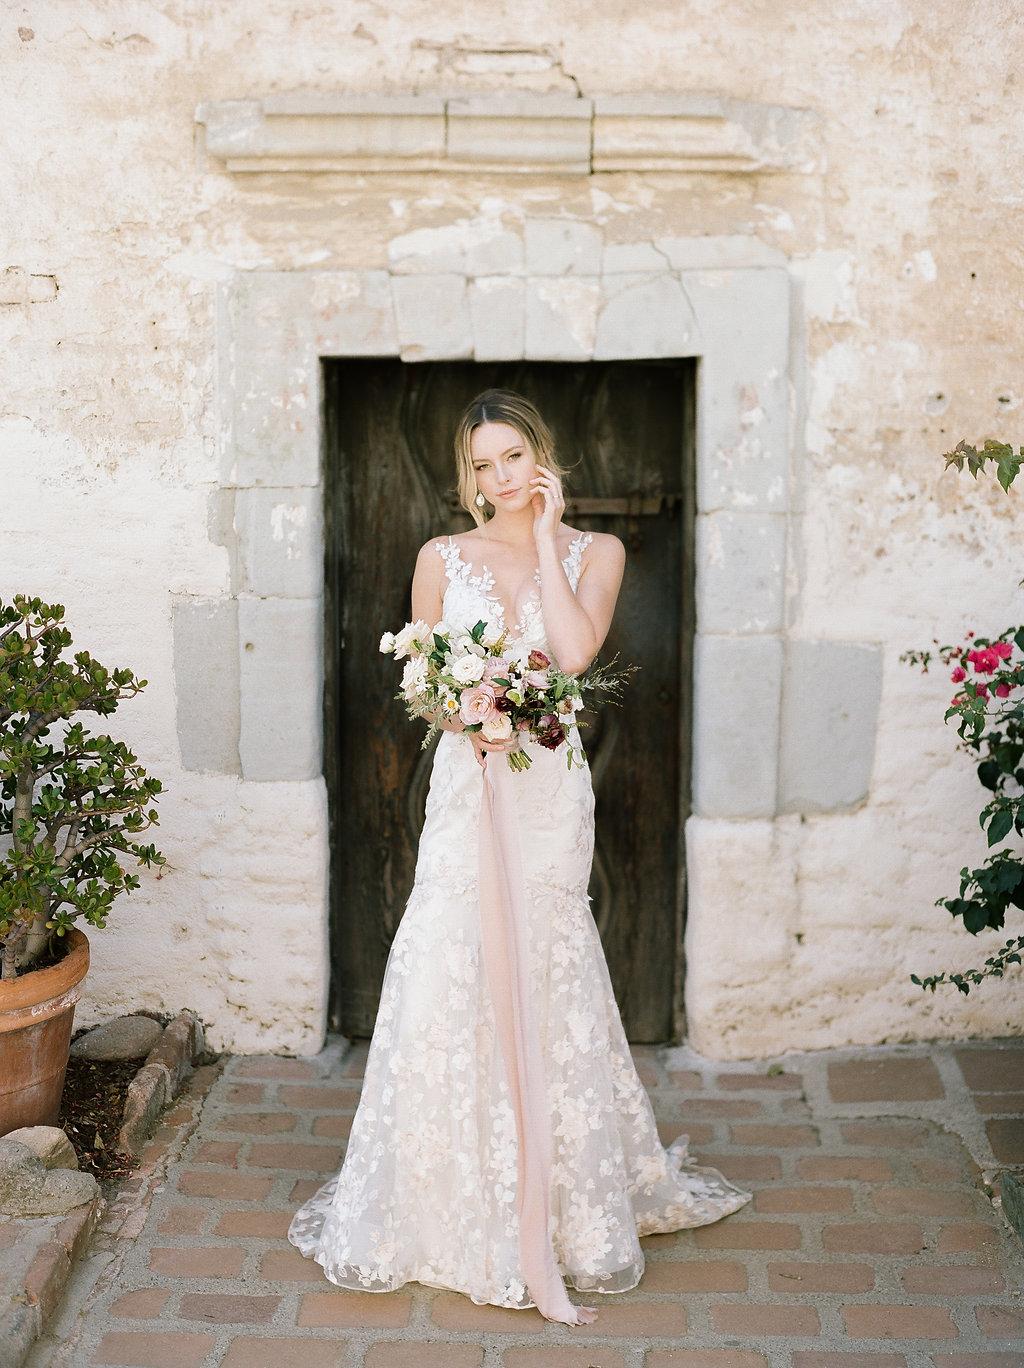 Spanish Mission Style Wedding Ideas Bridal Bouquet Summer Flowers Finding Flora Wedding Sparrow Fine Art Claire Pettibone